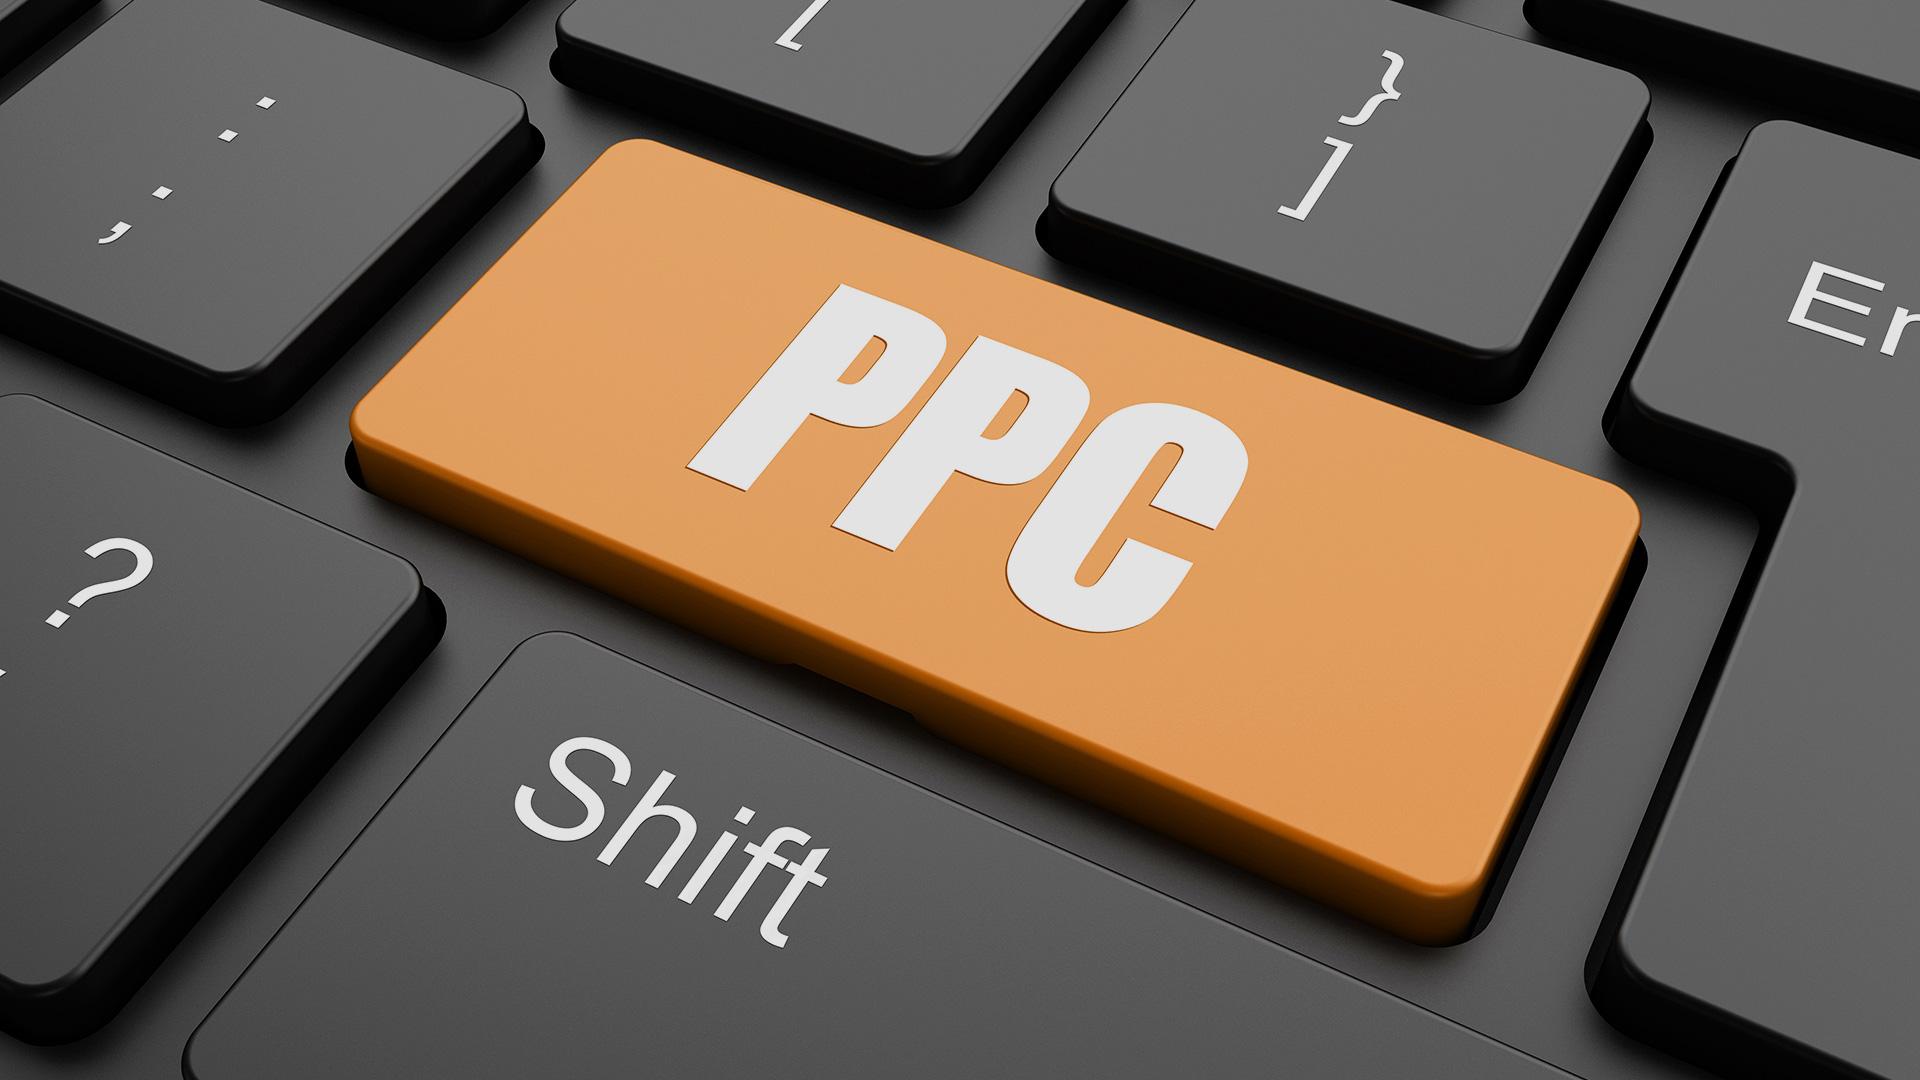 ppc-pay-per-click2-ss-1920